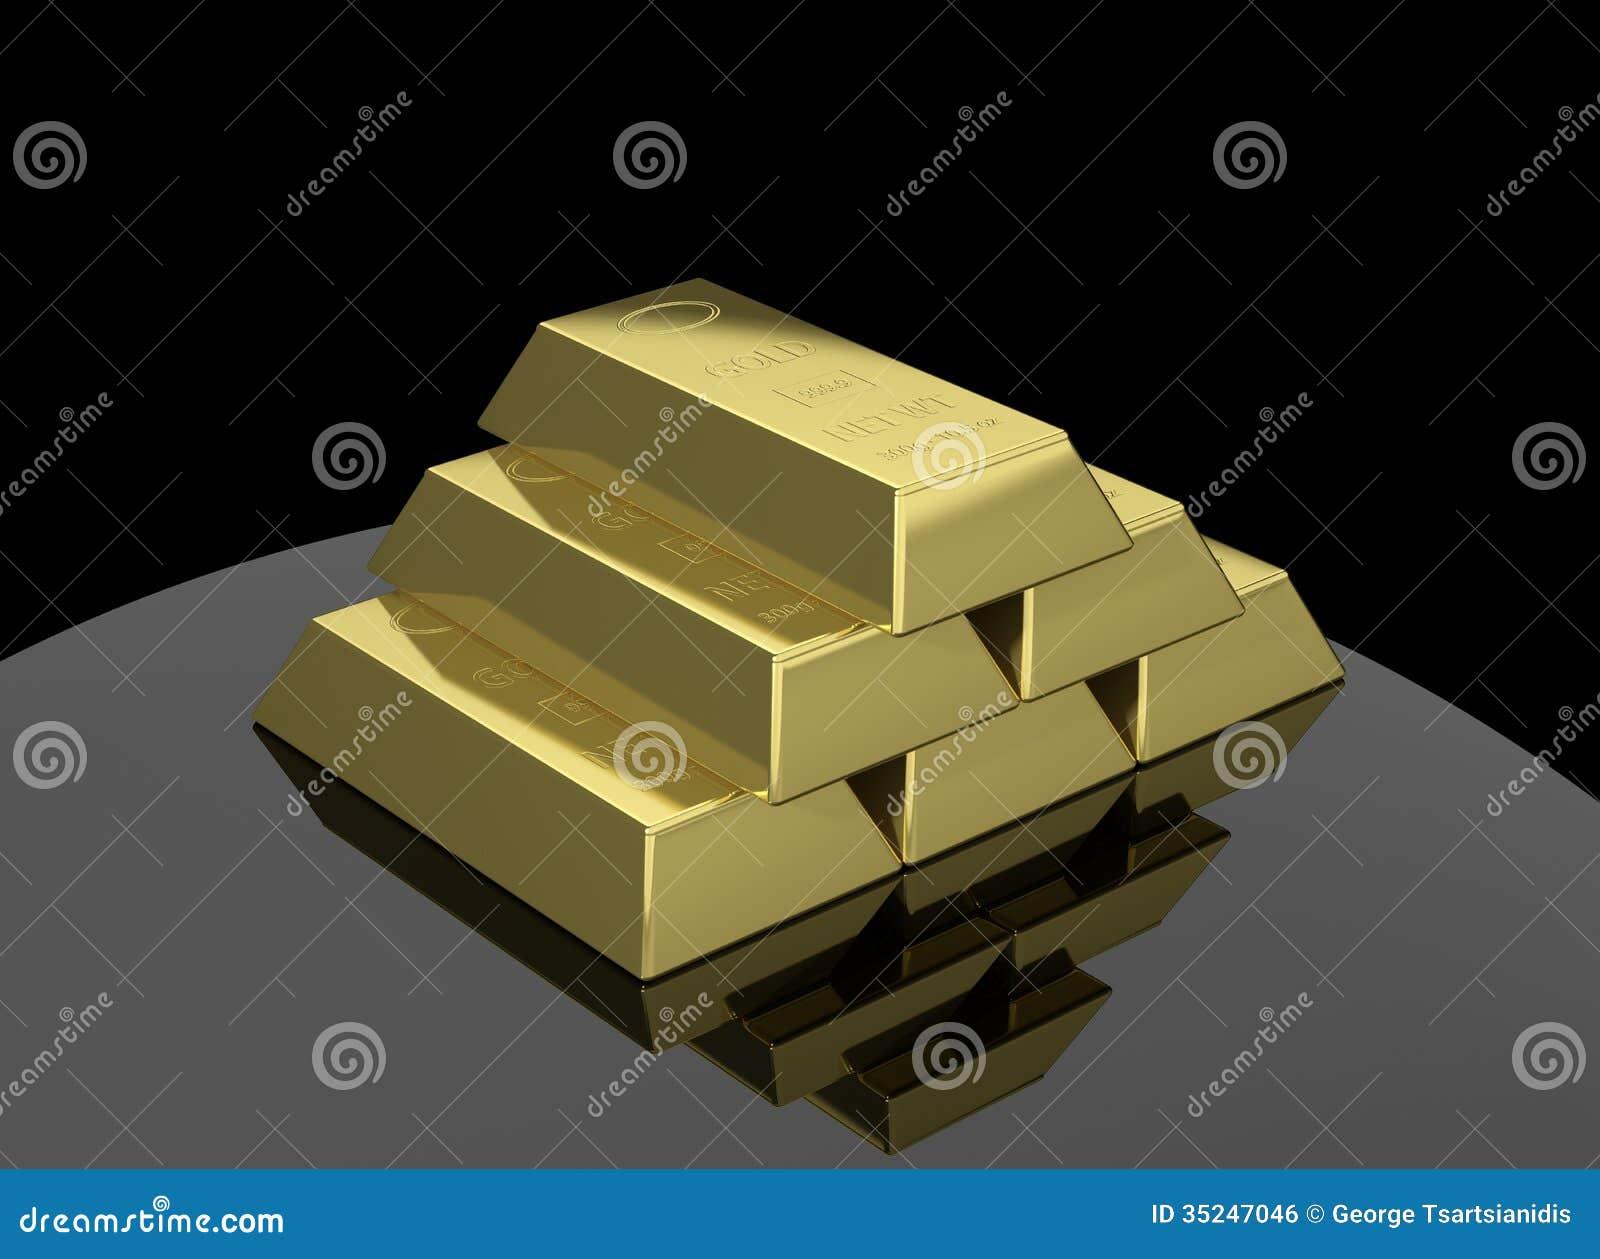 gold bar black background - photo #28